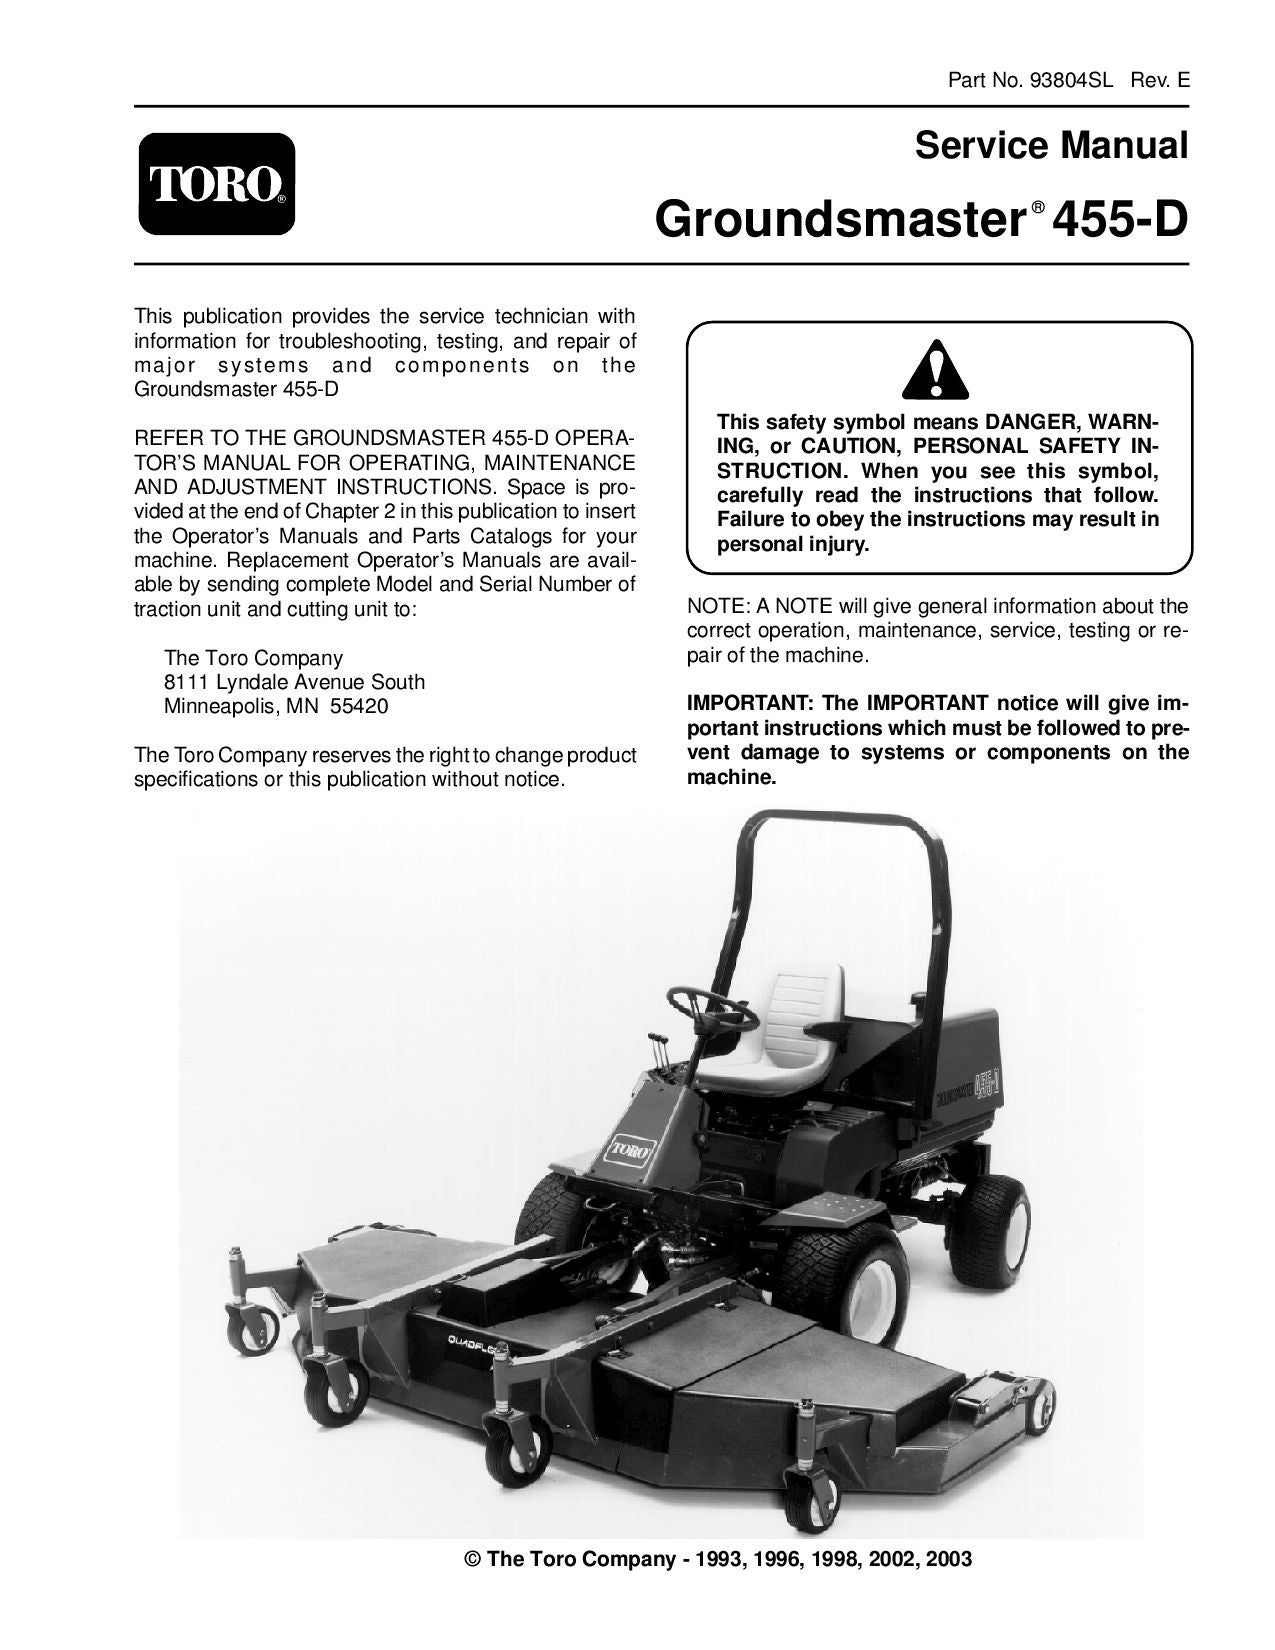 Toro push mower manual array 93804sl pdf groundsmaster 455 d rev e 2003 by negimachi negimachi rh fandeluxe Images